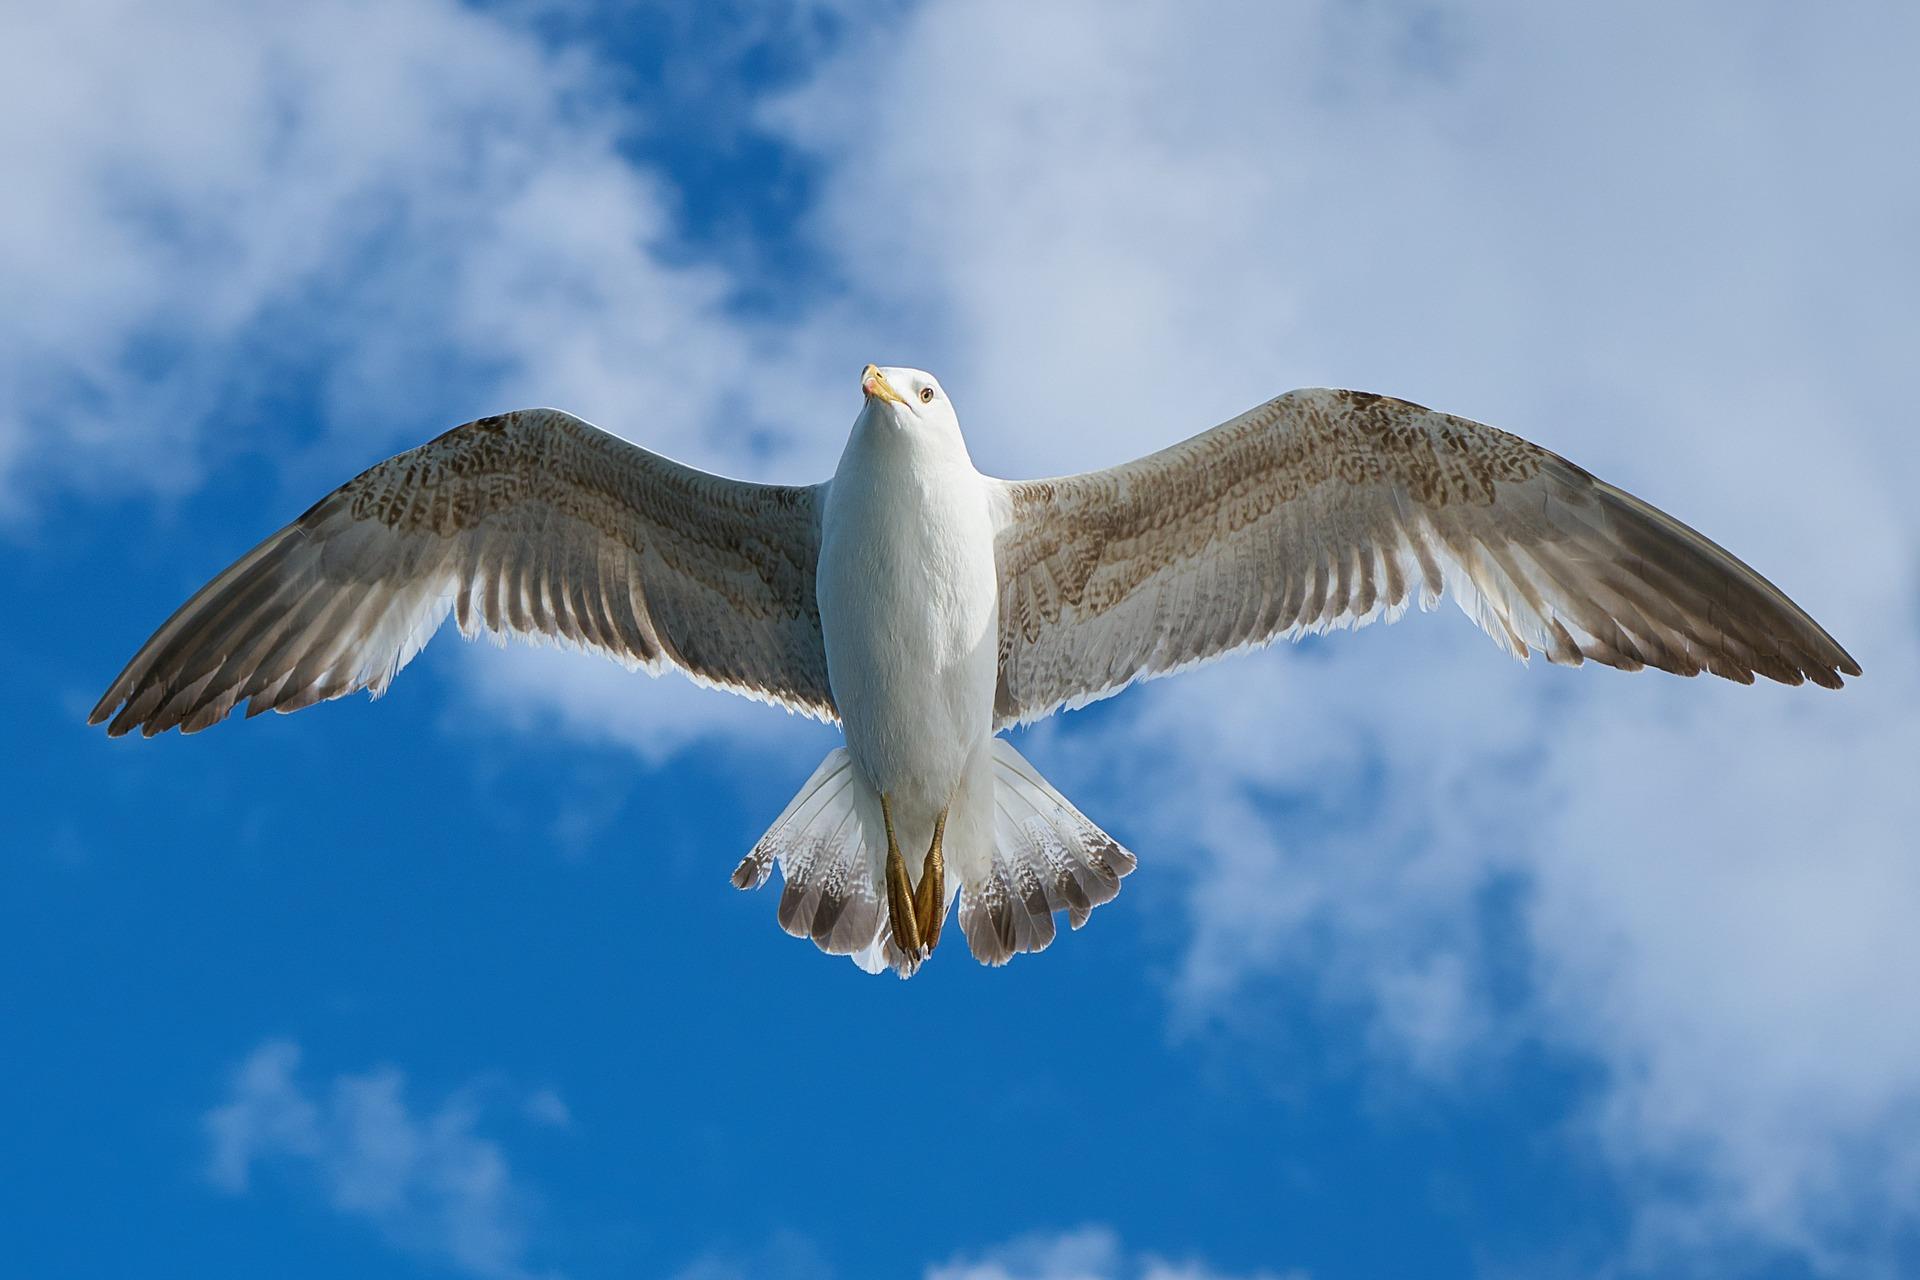 VIRAL: Seagull Slams Into Teen On Amusement Ride